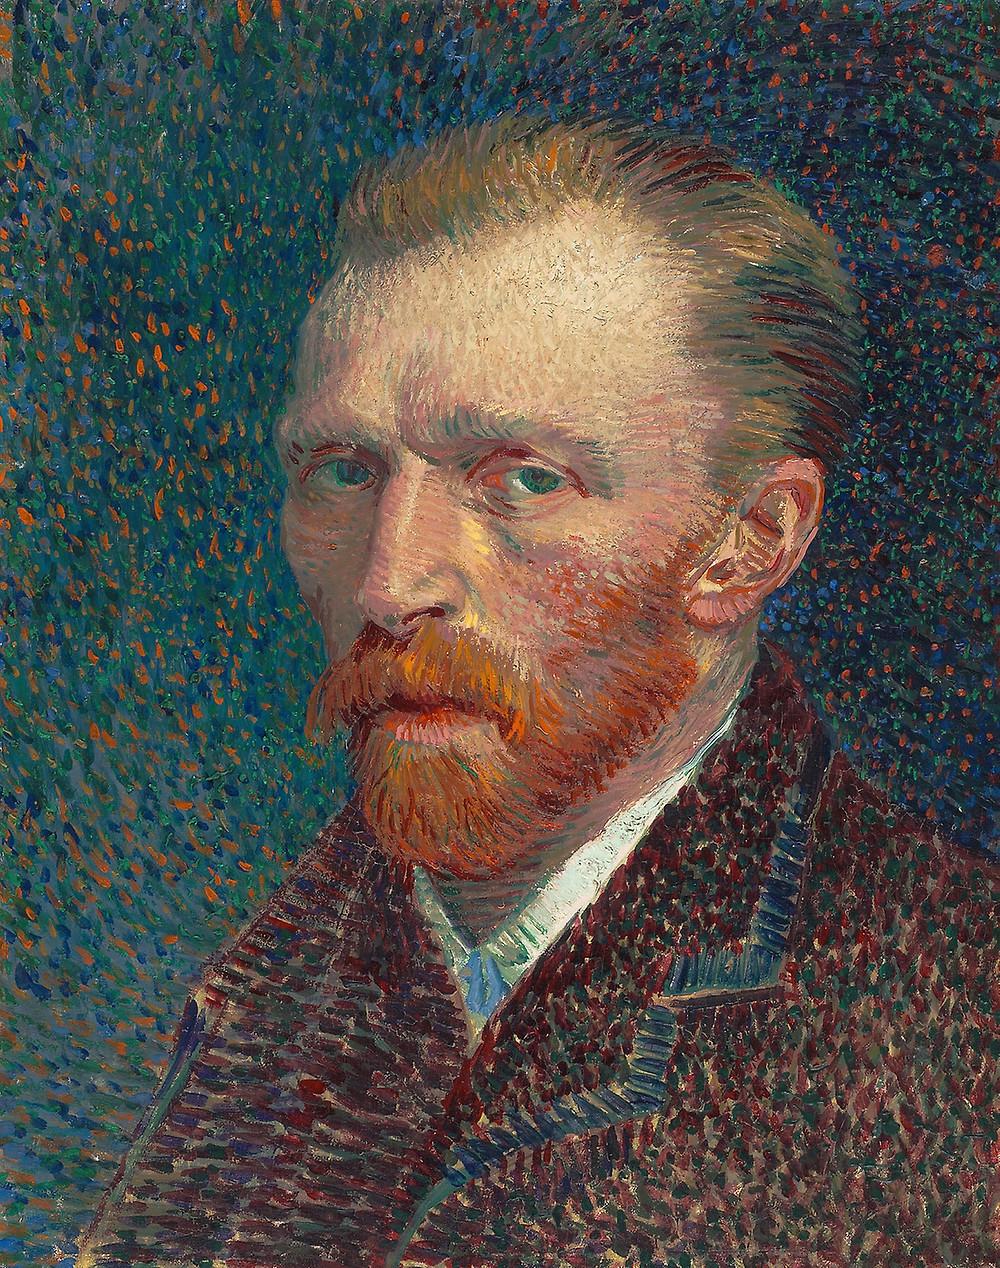 Van Gogh, Self Portrait, 1887